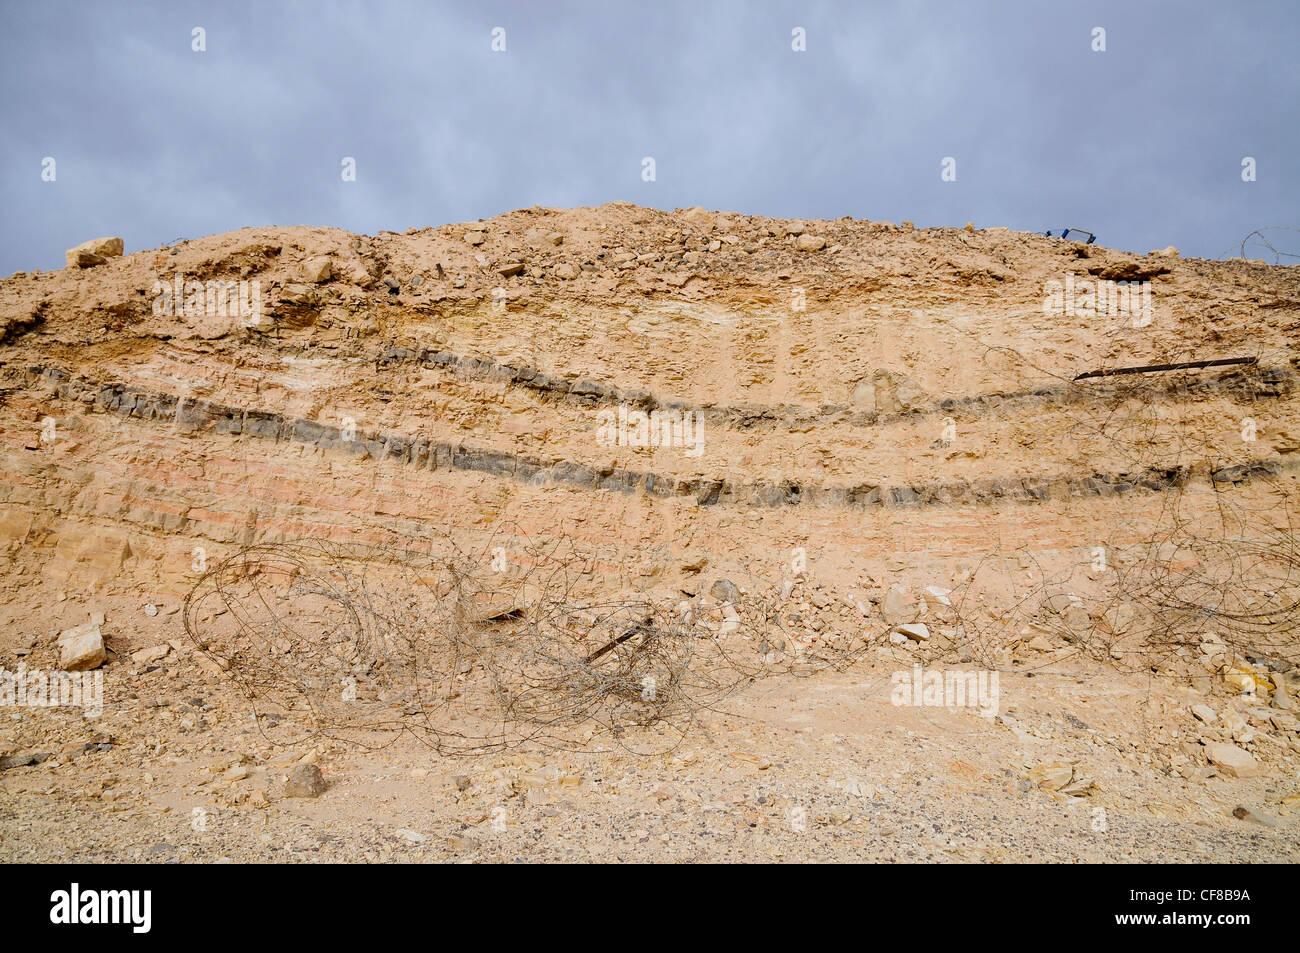 Israel, Arava, Sediment layers on the Graet Rift Valley Stock Photo